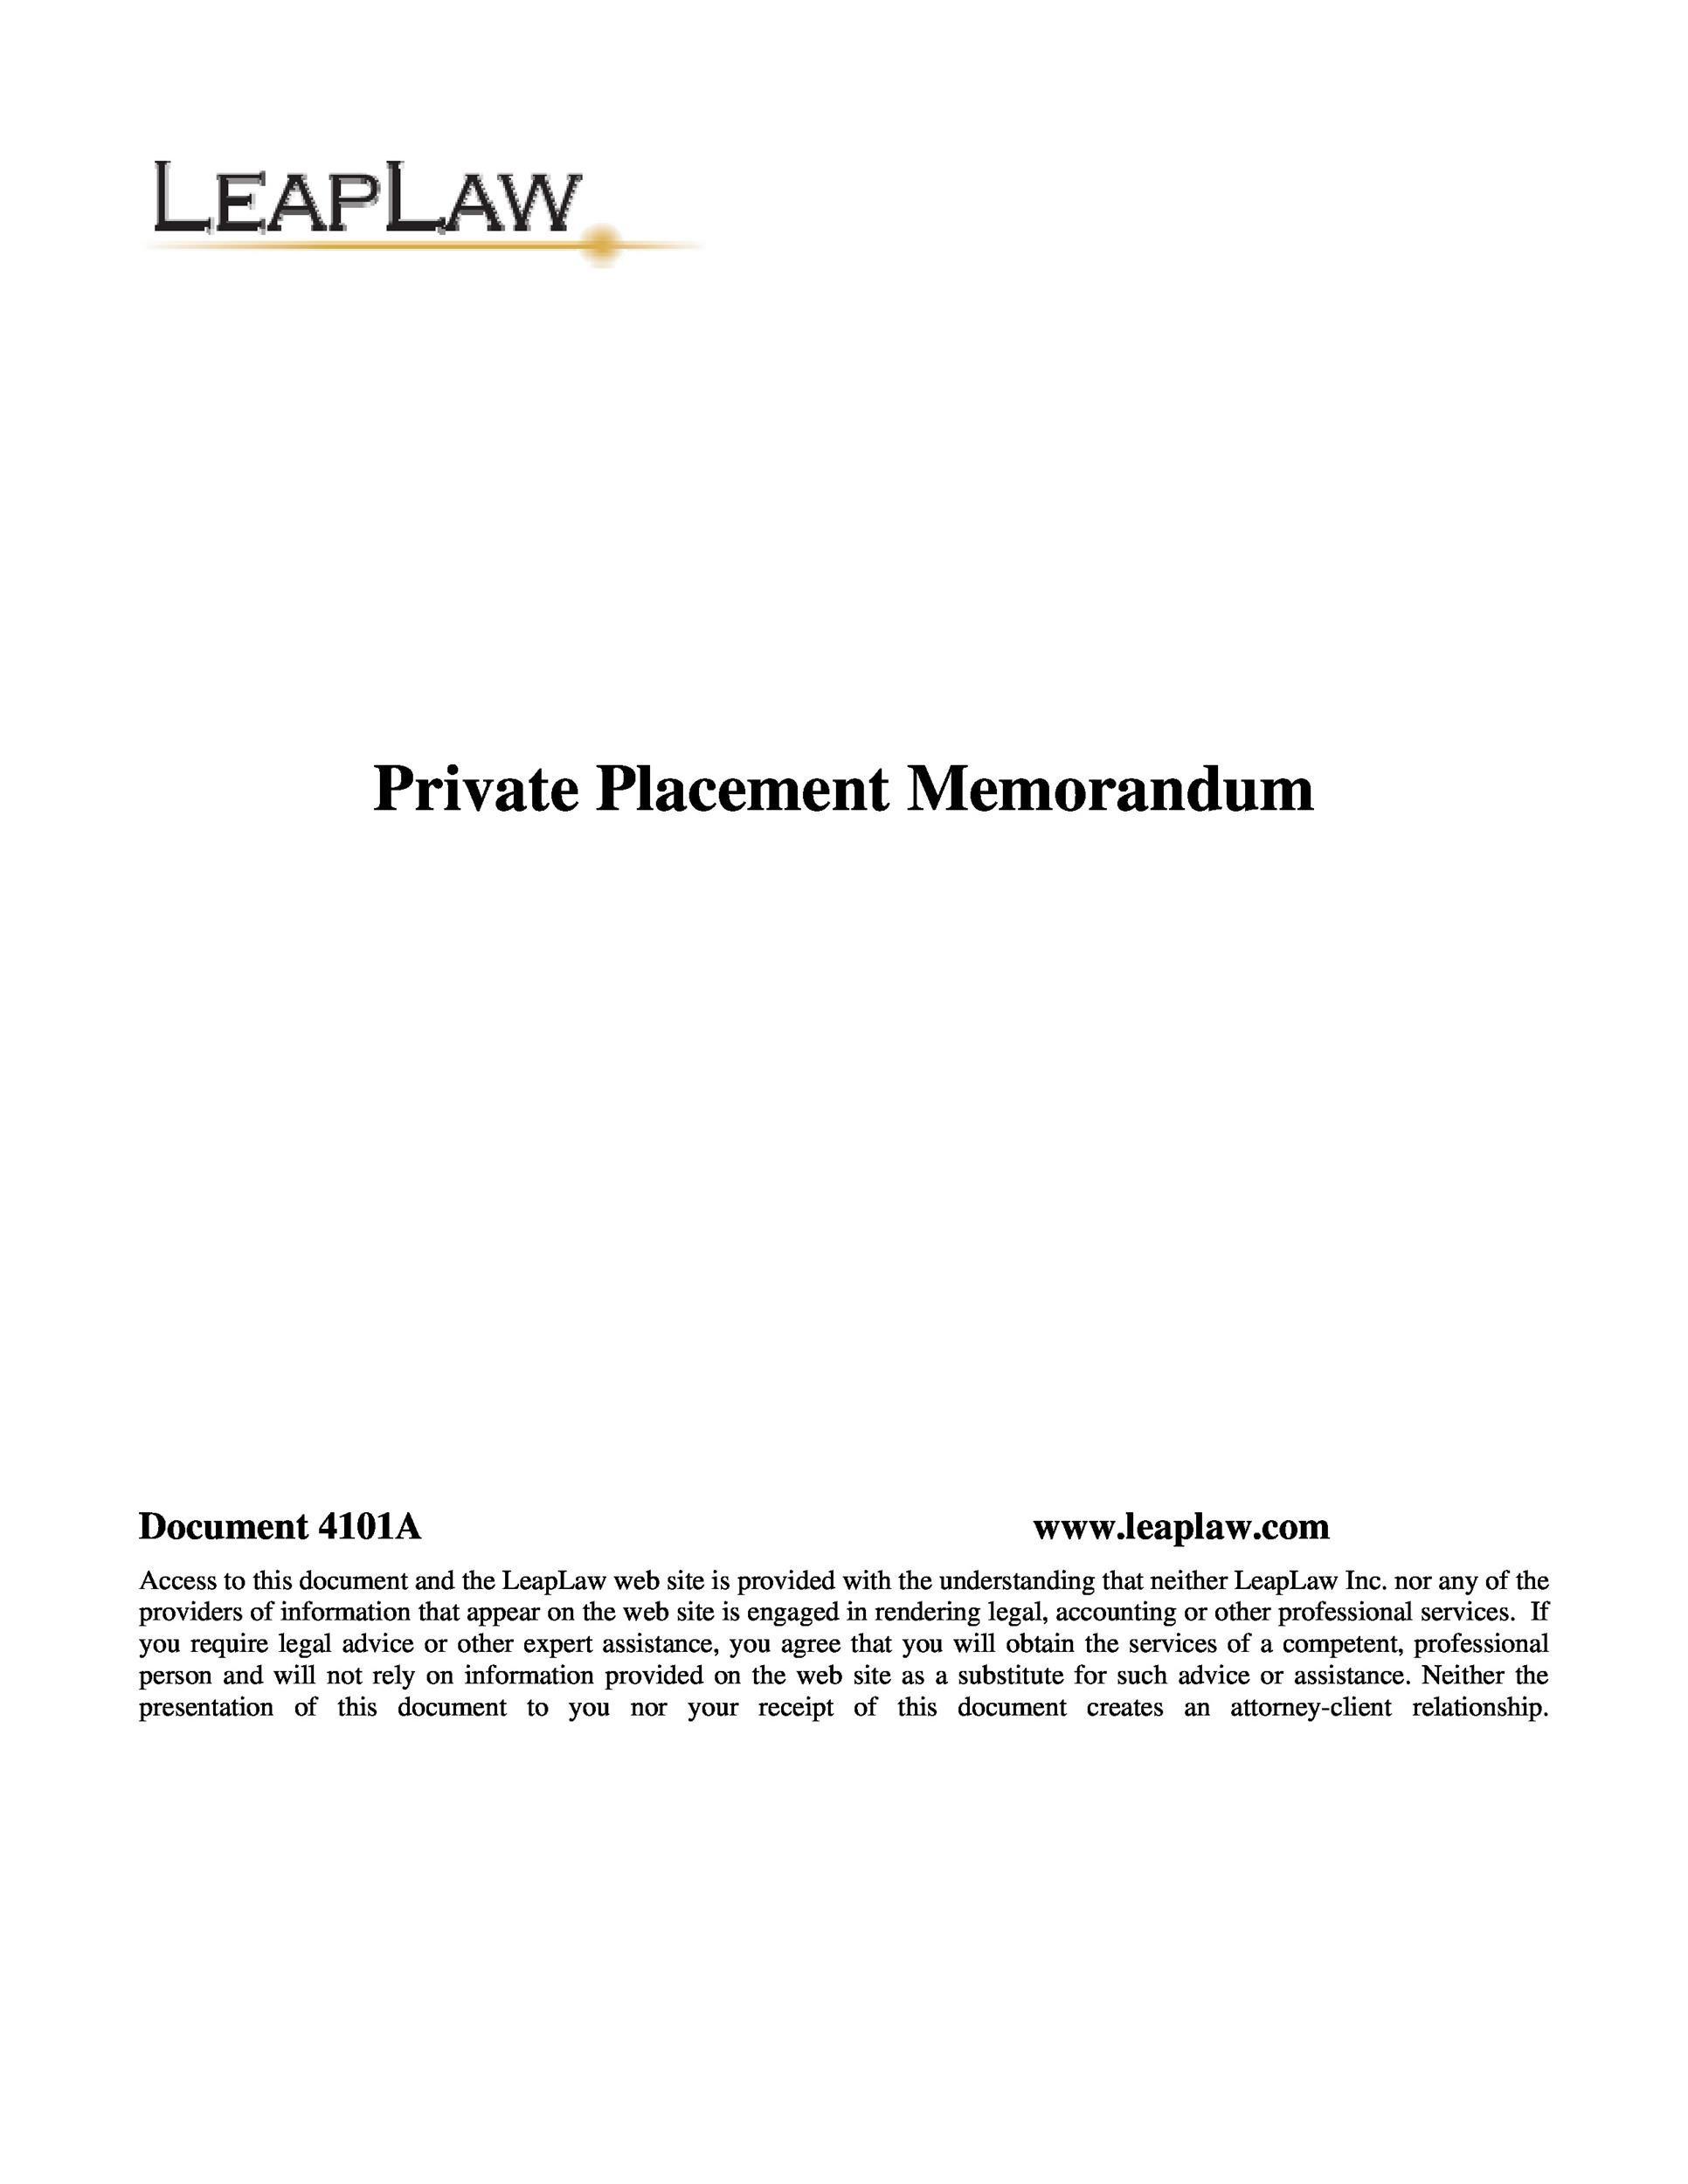 Free private placement memorandum template 24